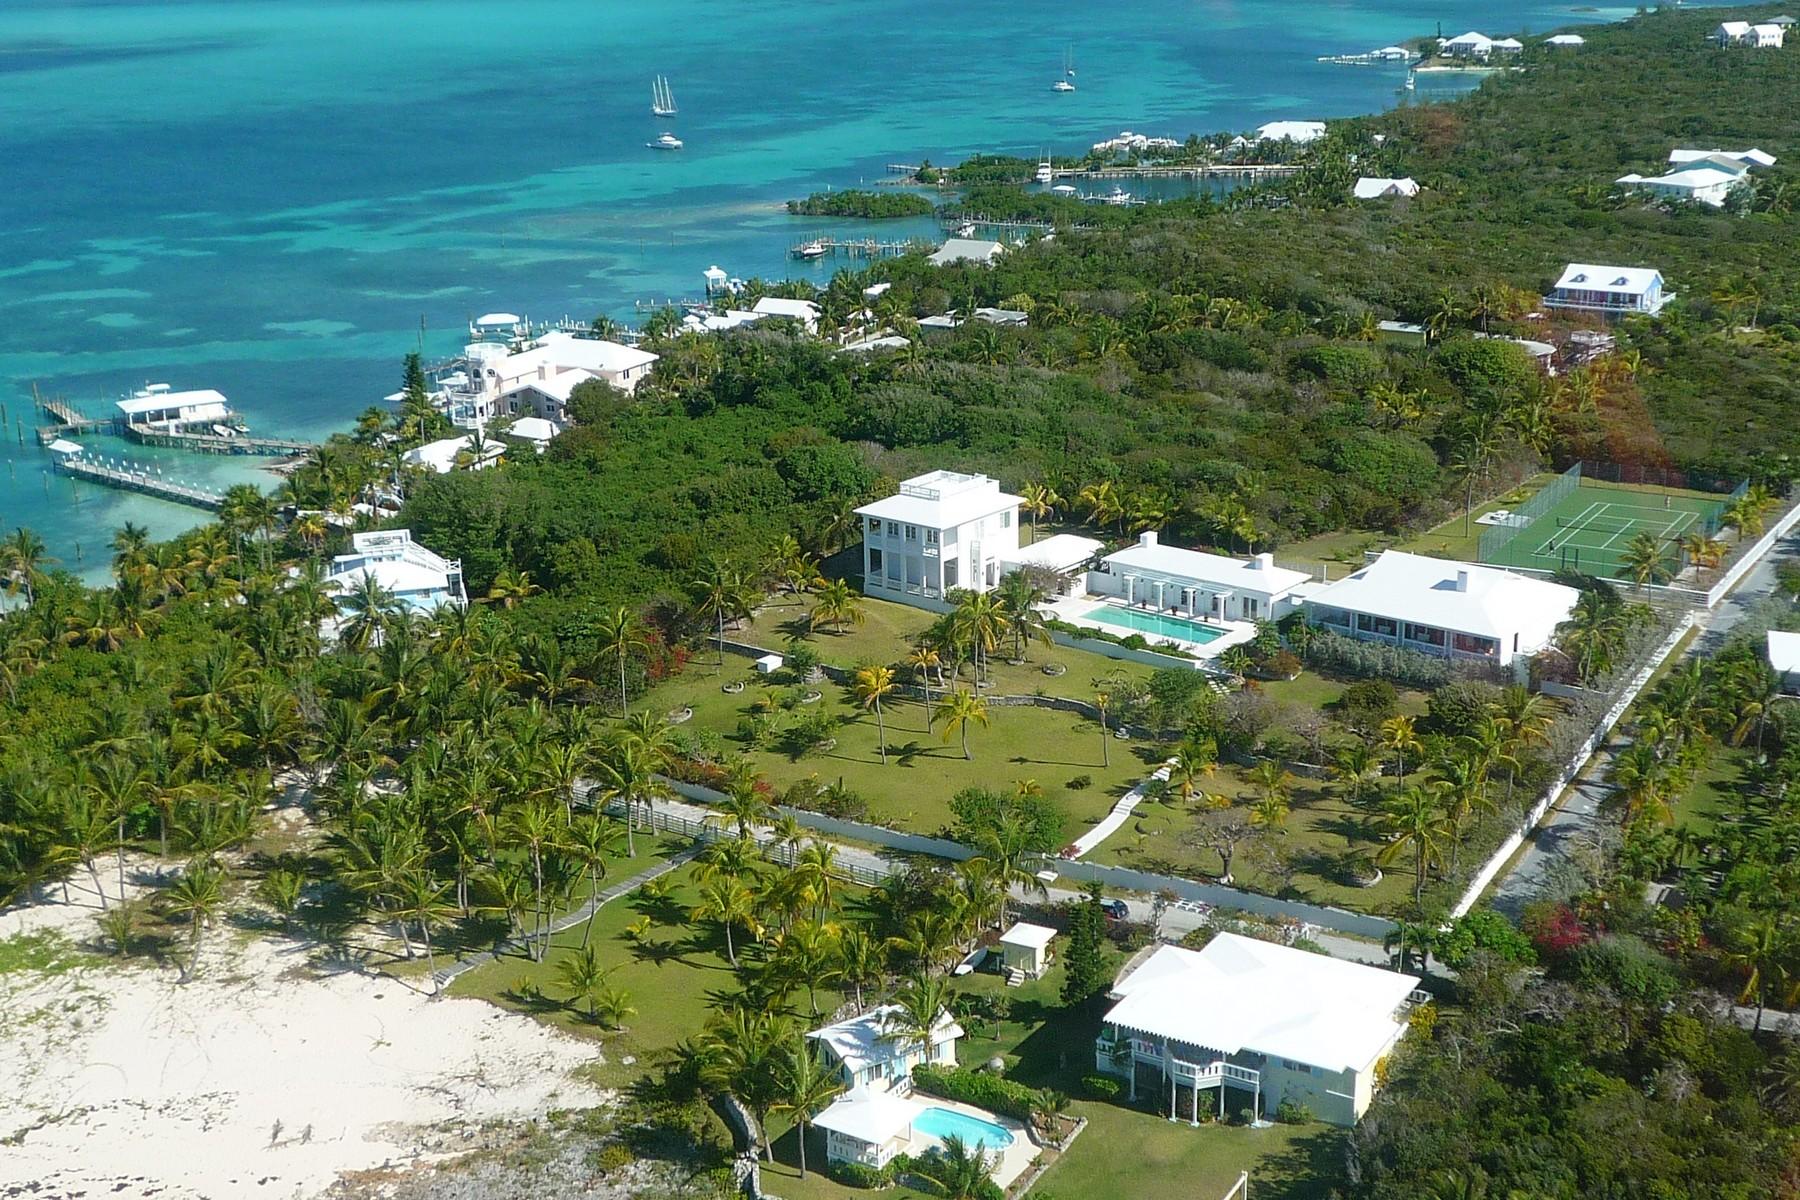 Moradia para Venda às Coconut Grove Elbow Cay Hope Town, Abaco Bahamas